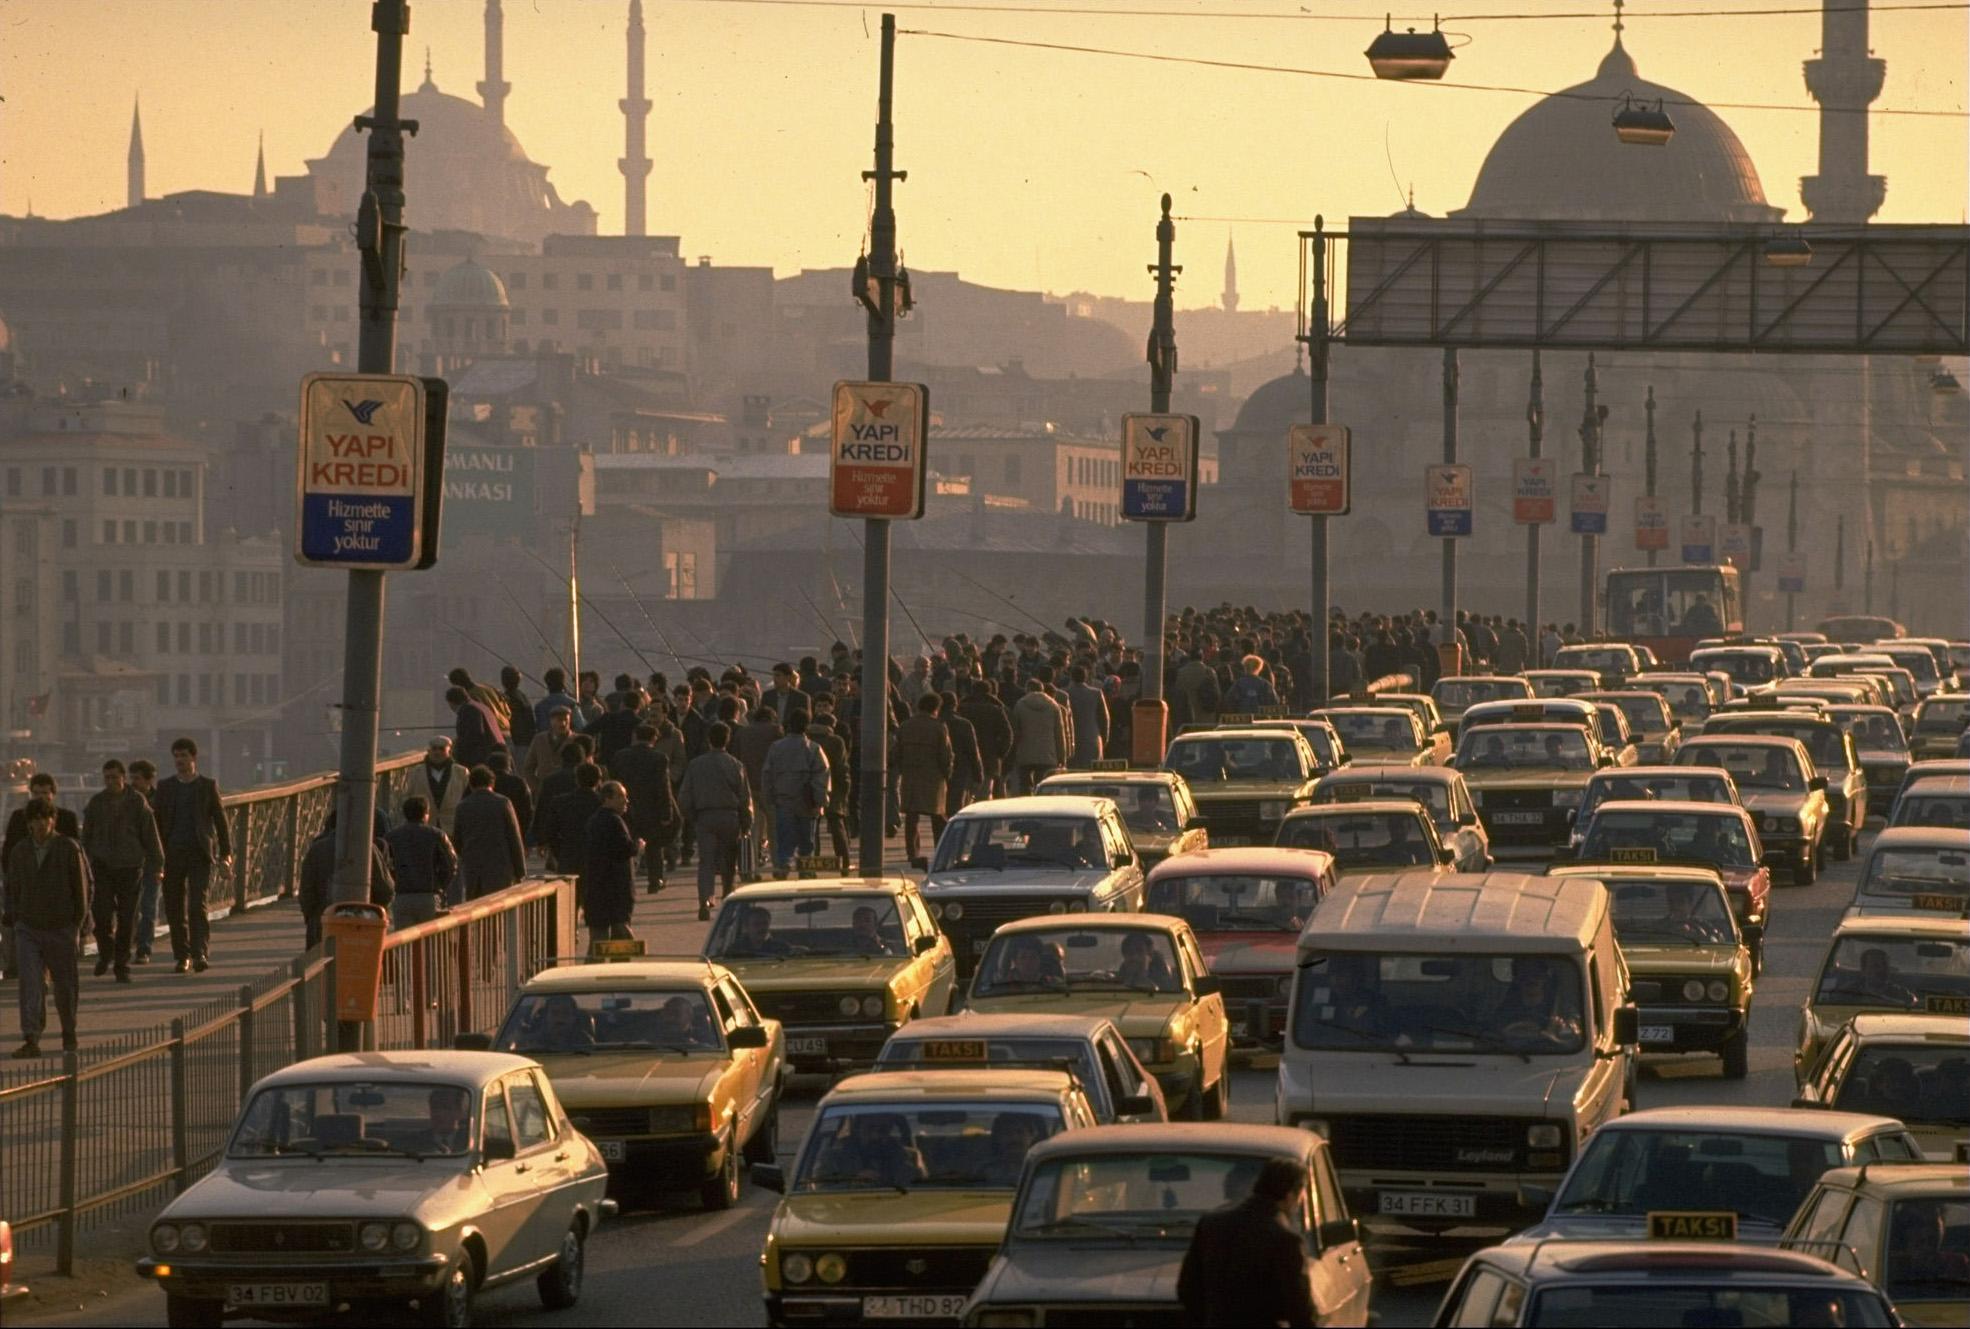 1989 Istanbul Galata Bridge